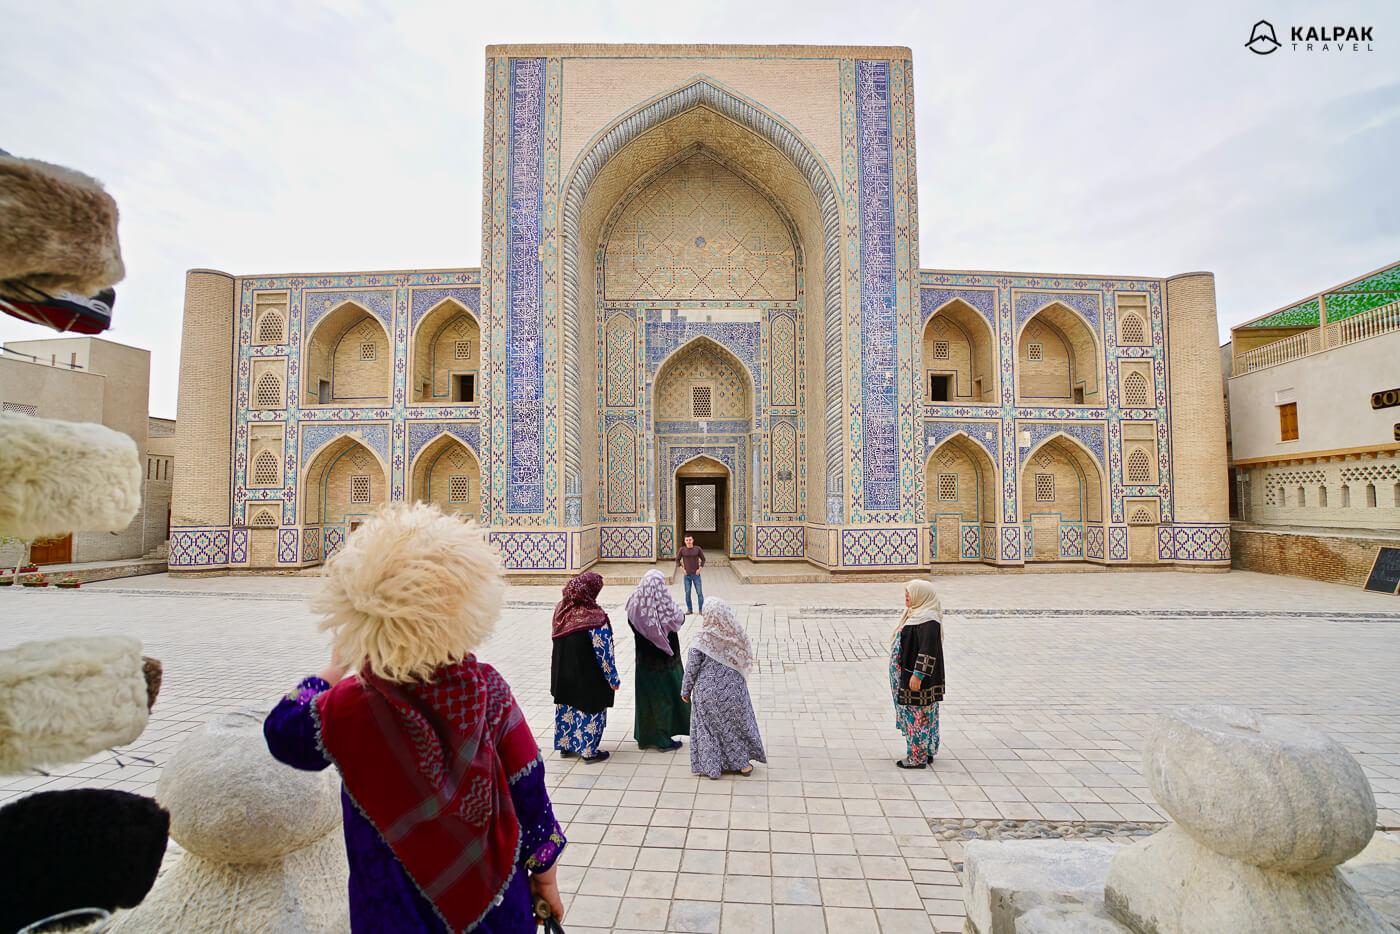 Ulughbek Madrasah in Bukhara